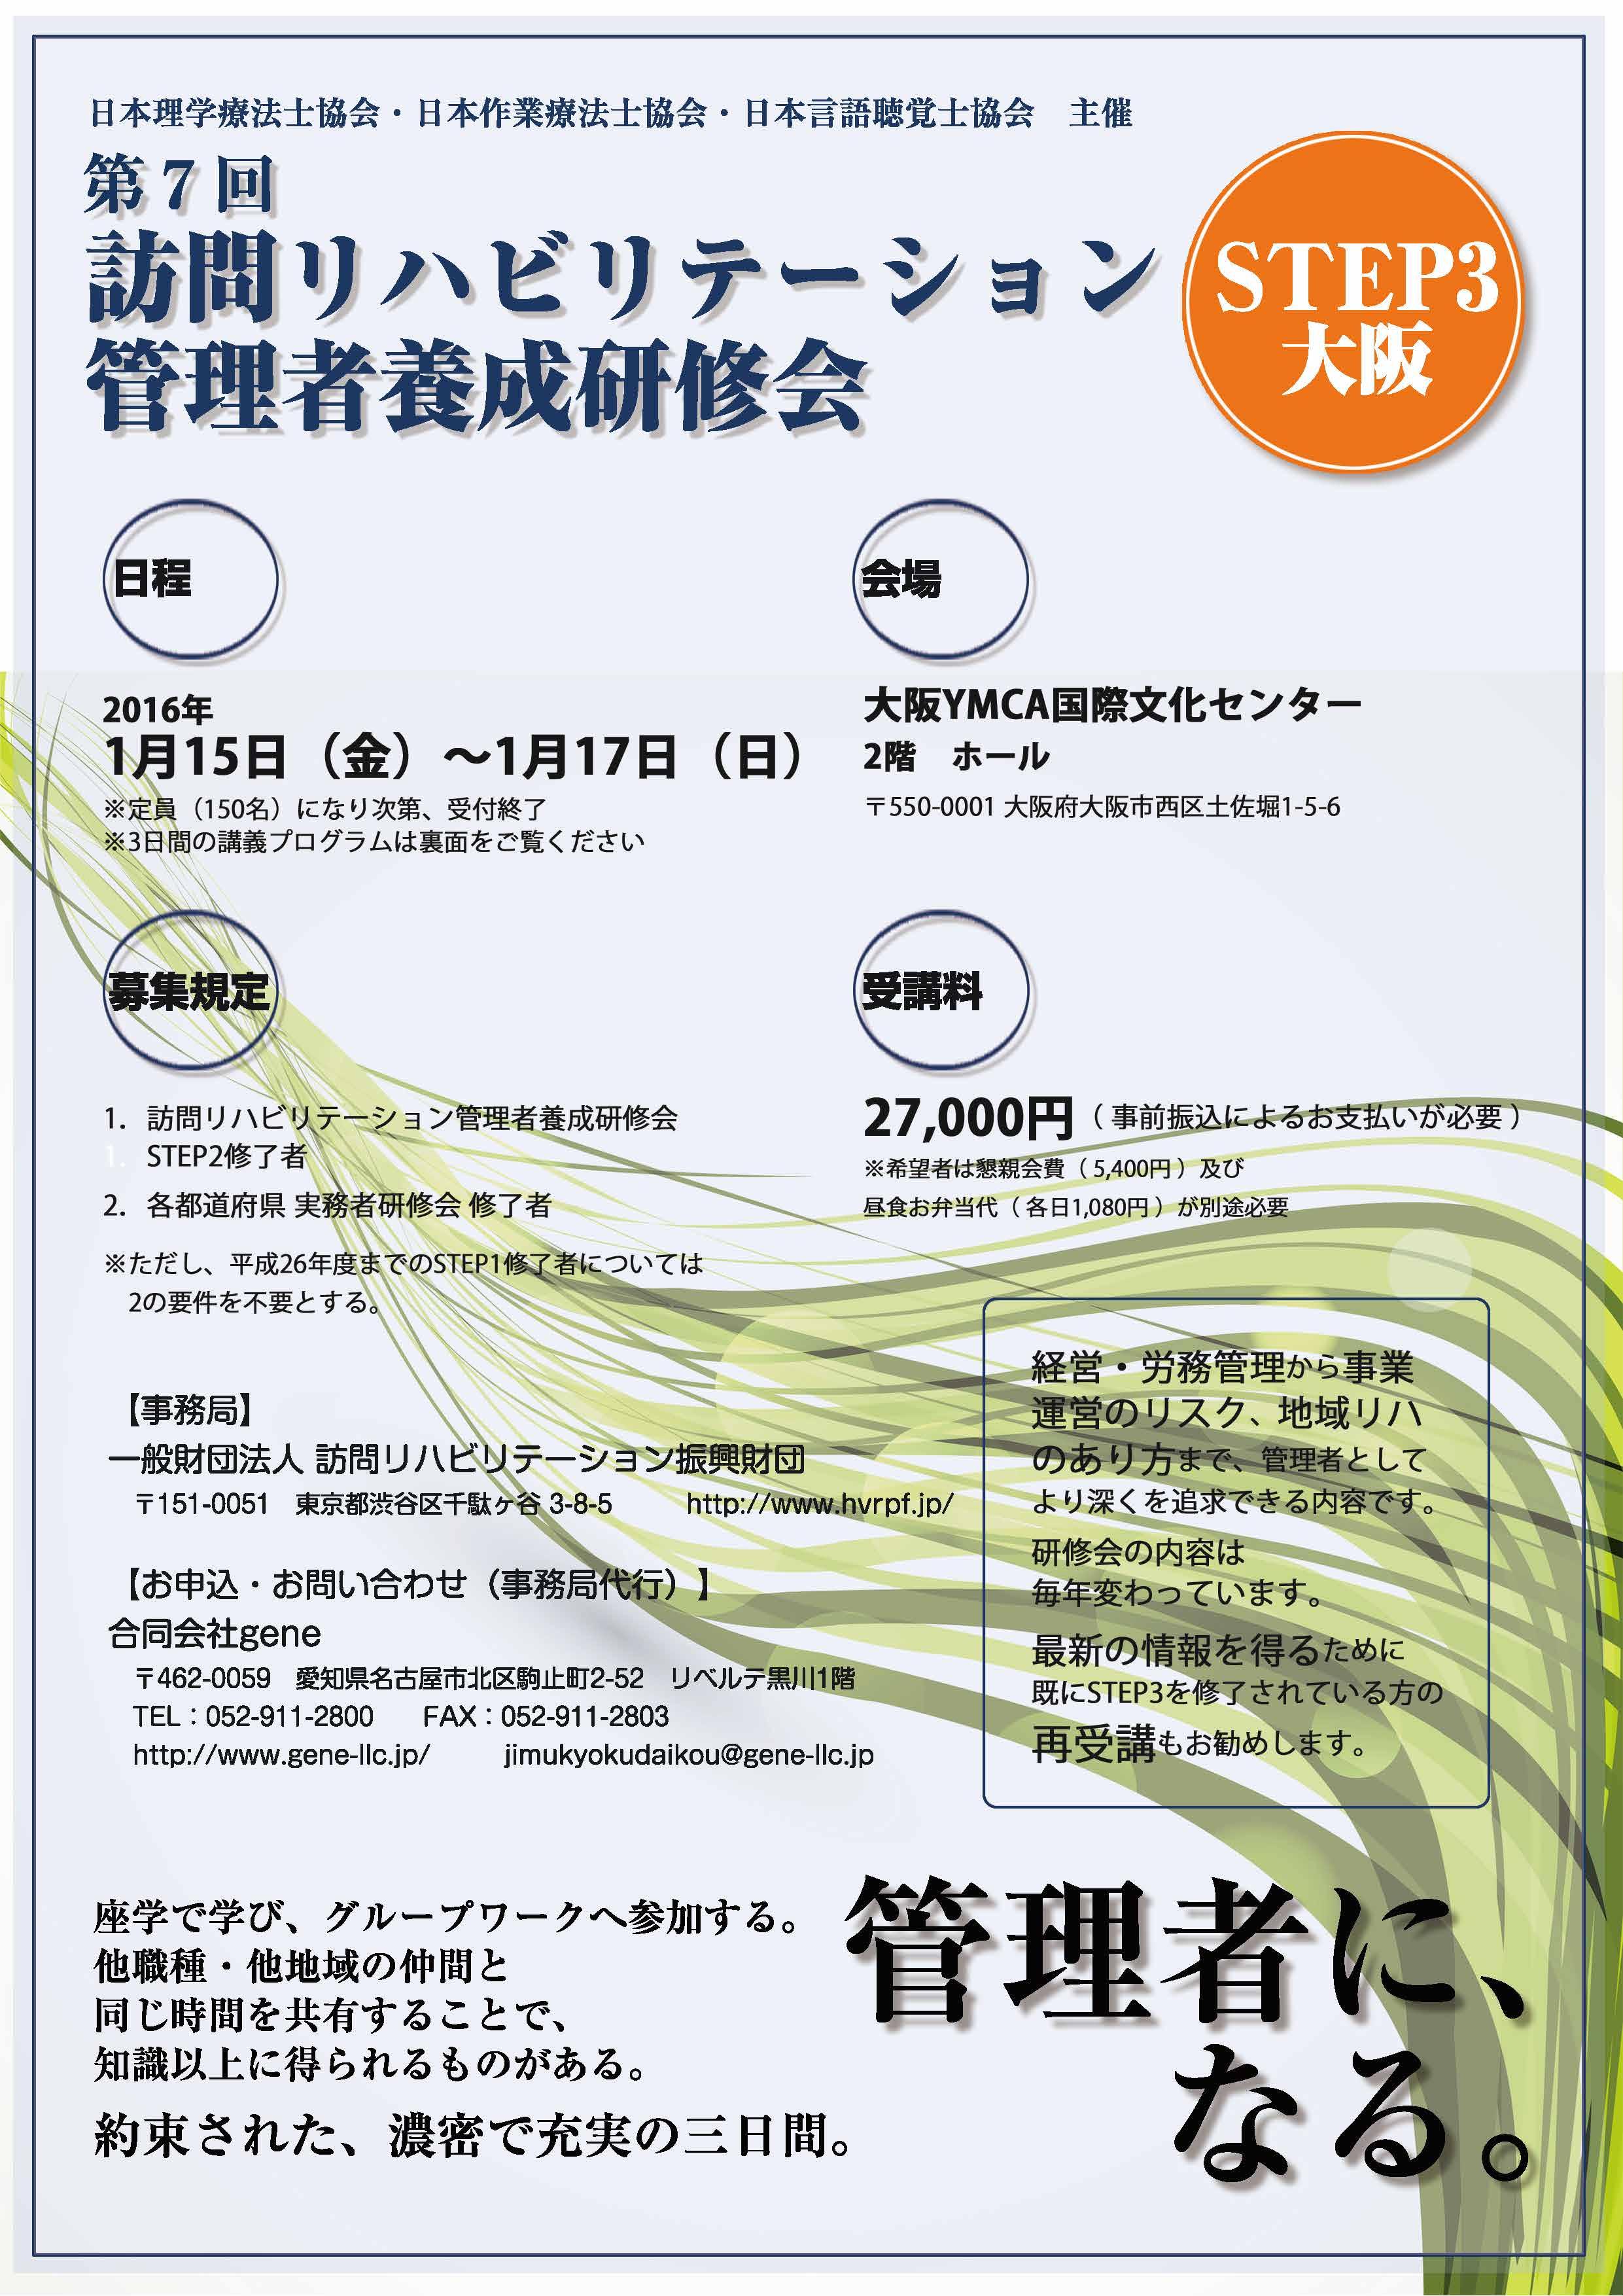 STEP3大阪チラシ(カラー)